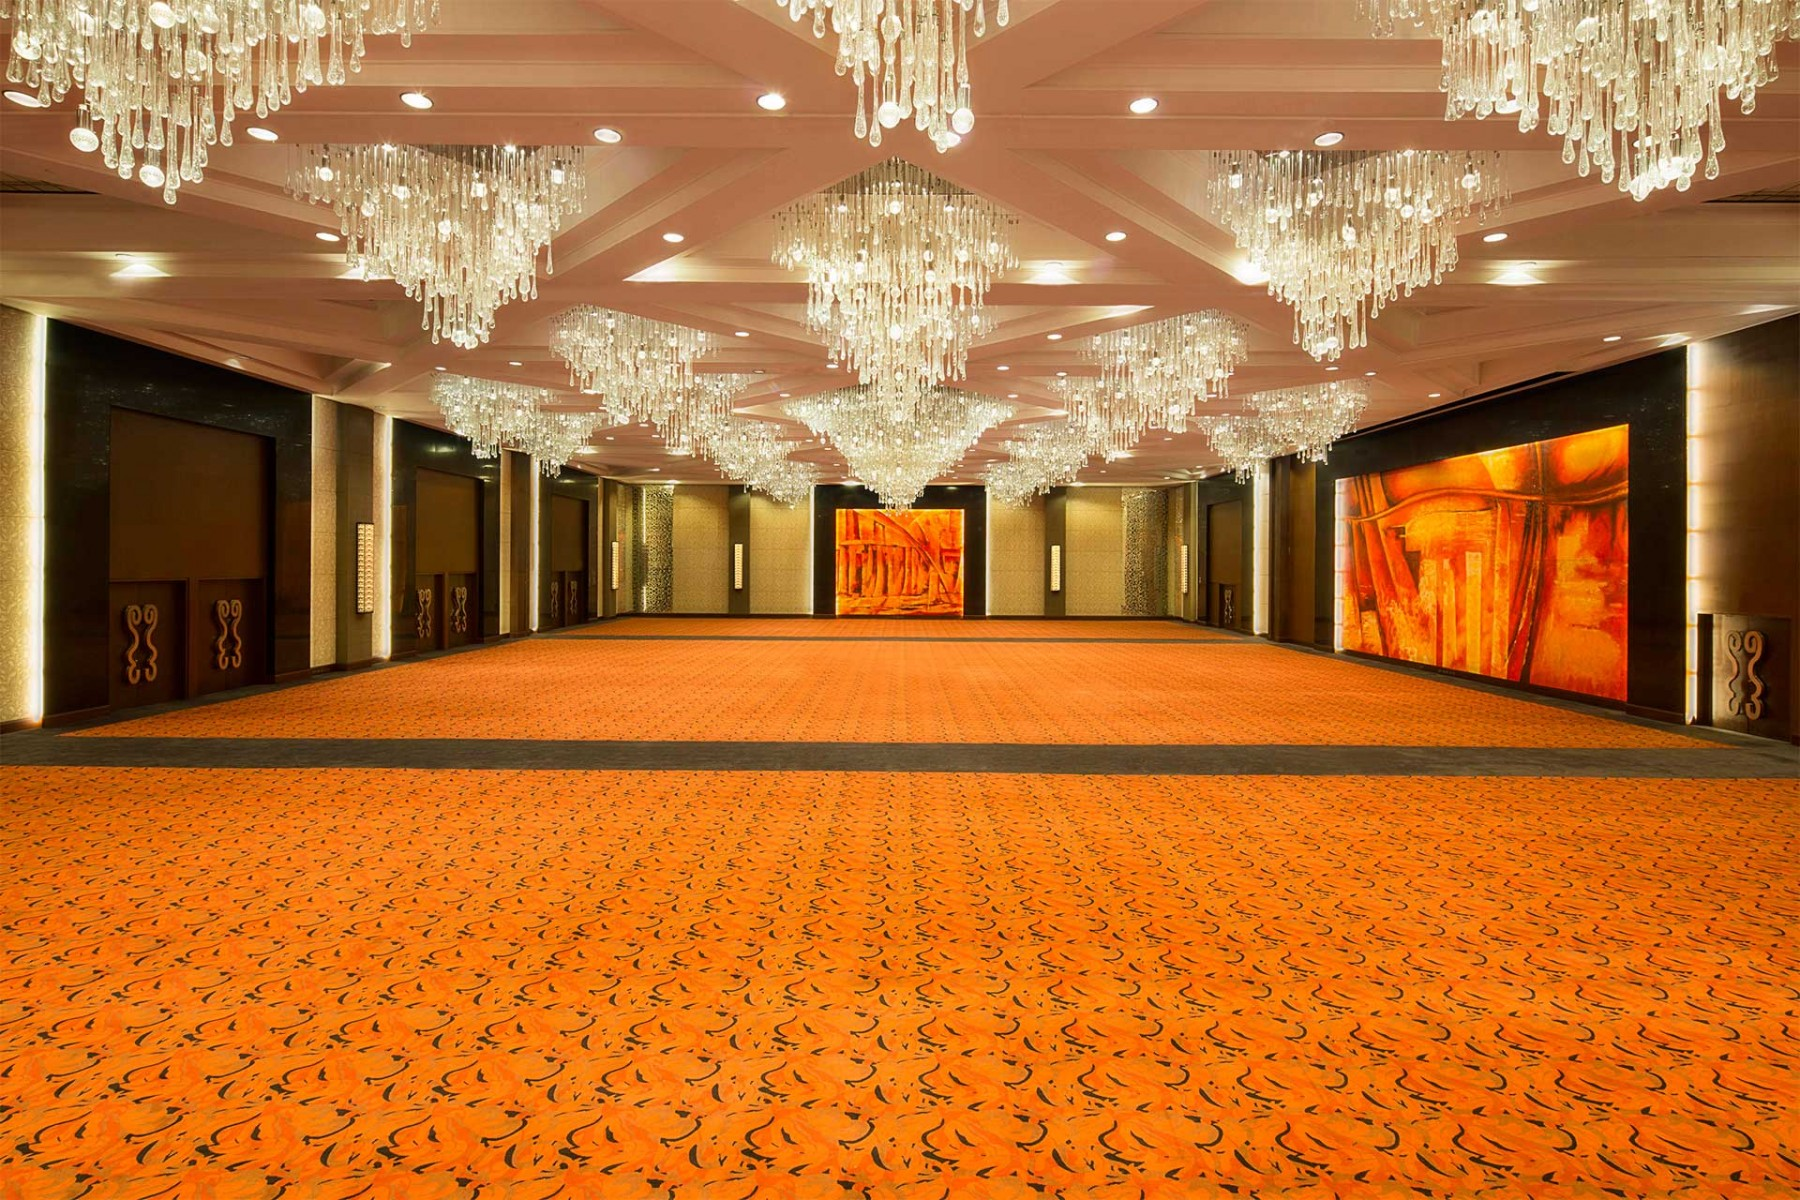 sofitel-unveils-the-new-look-of-the-iconic-grand-plaza-ballroom